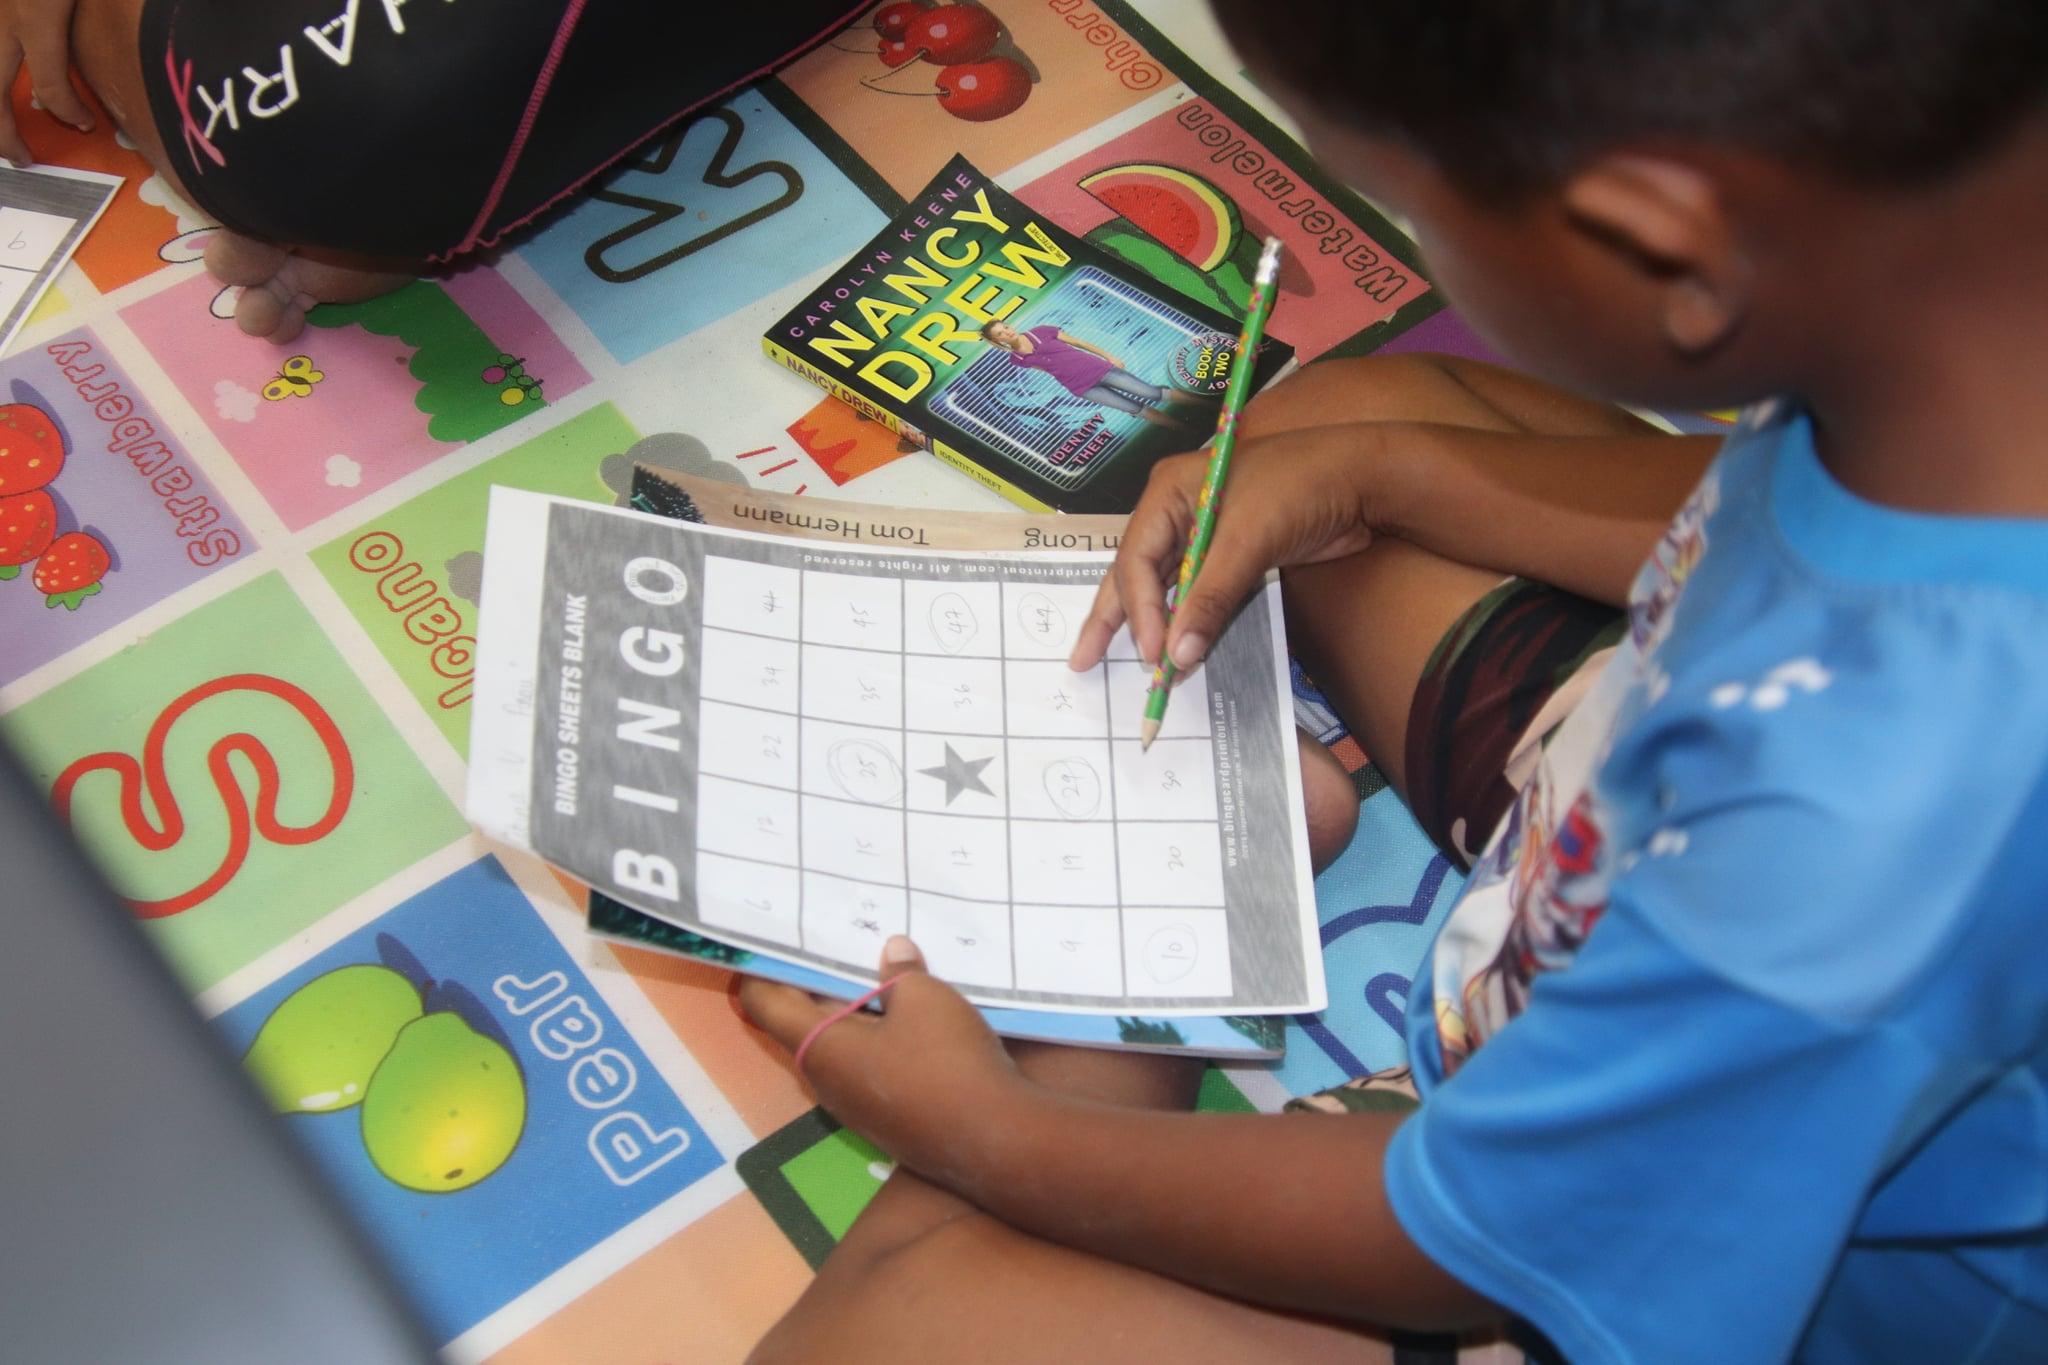 Tuvalu library